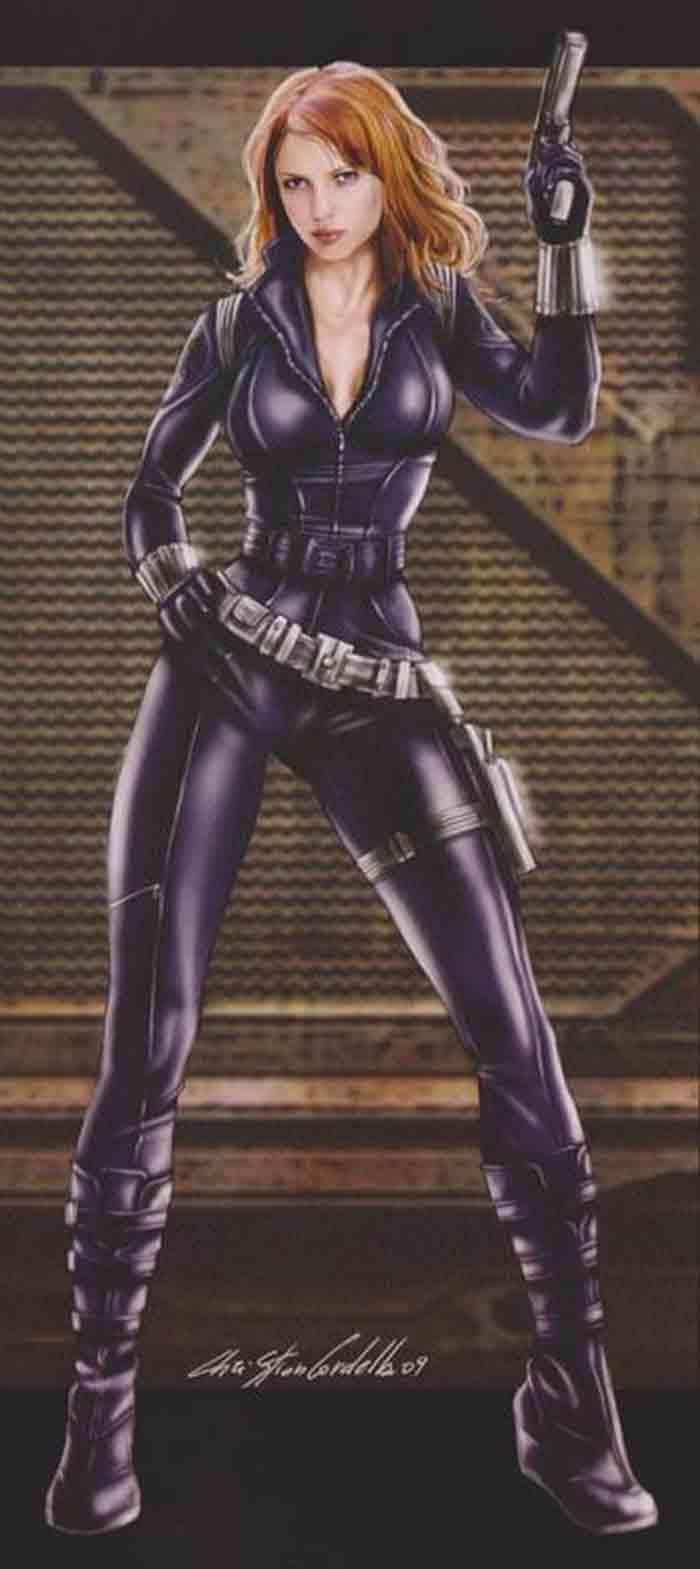 Diseño alternativo de Viuda Negra (Scarlett Johansson) en Marvel Studios